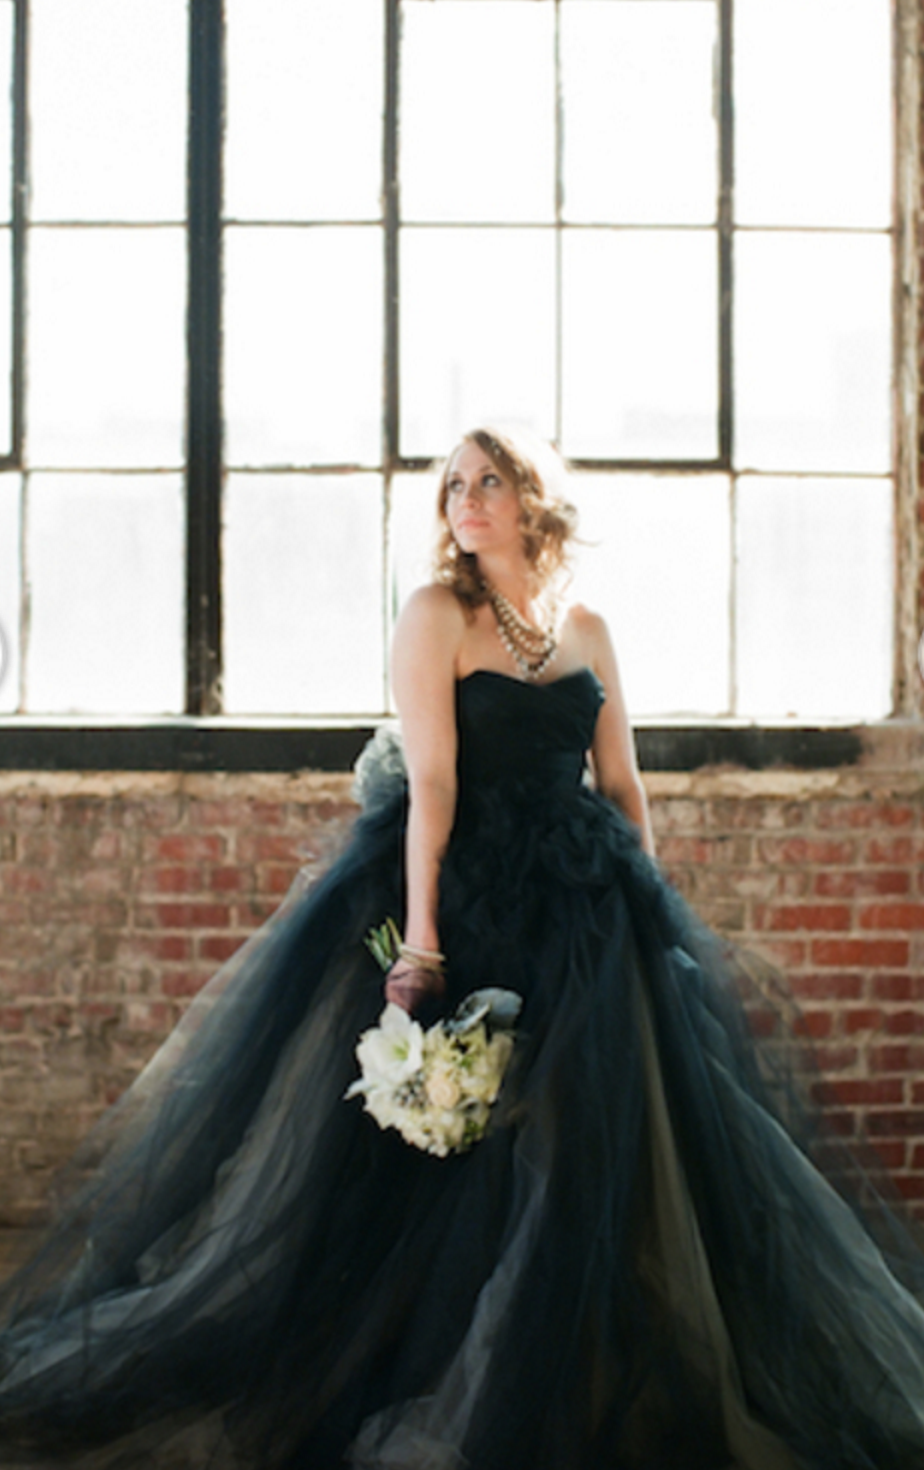 35 Incredible Black Wedding Dresses Black Wedding Dresses Black Wedding Gowns Bridesmaid Dresses [ 1470 x 924 Pixel ]